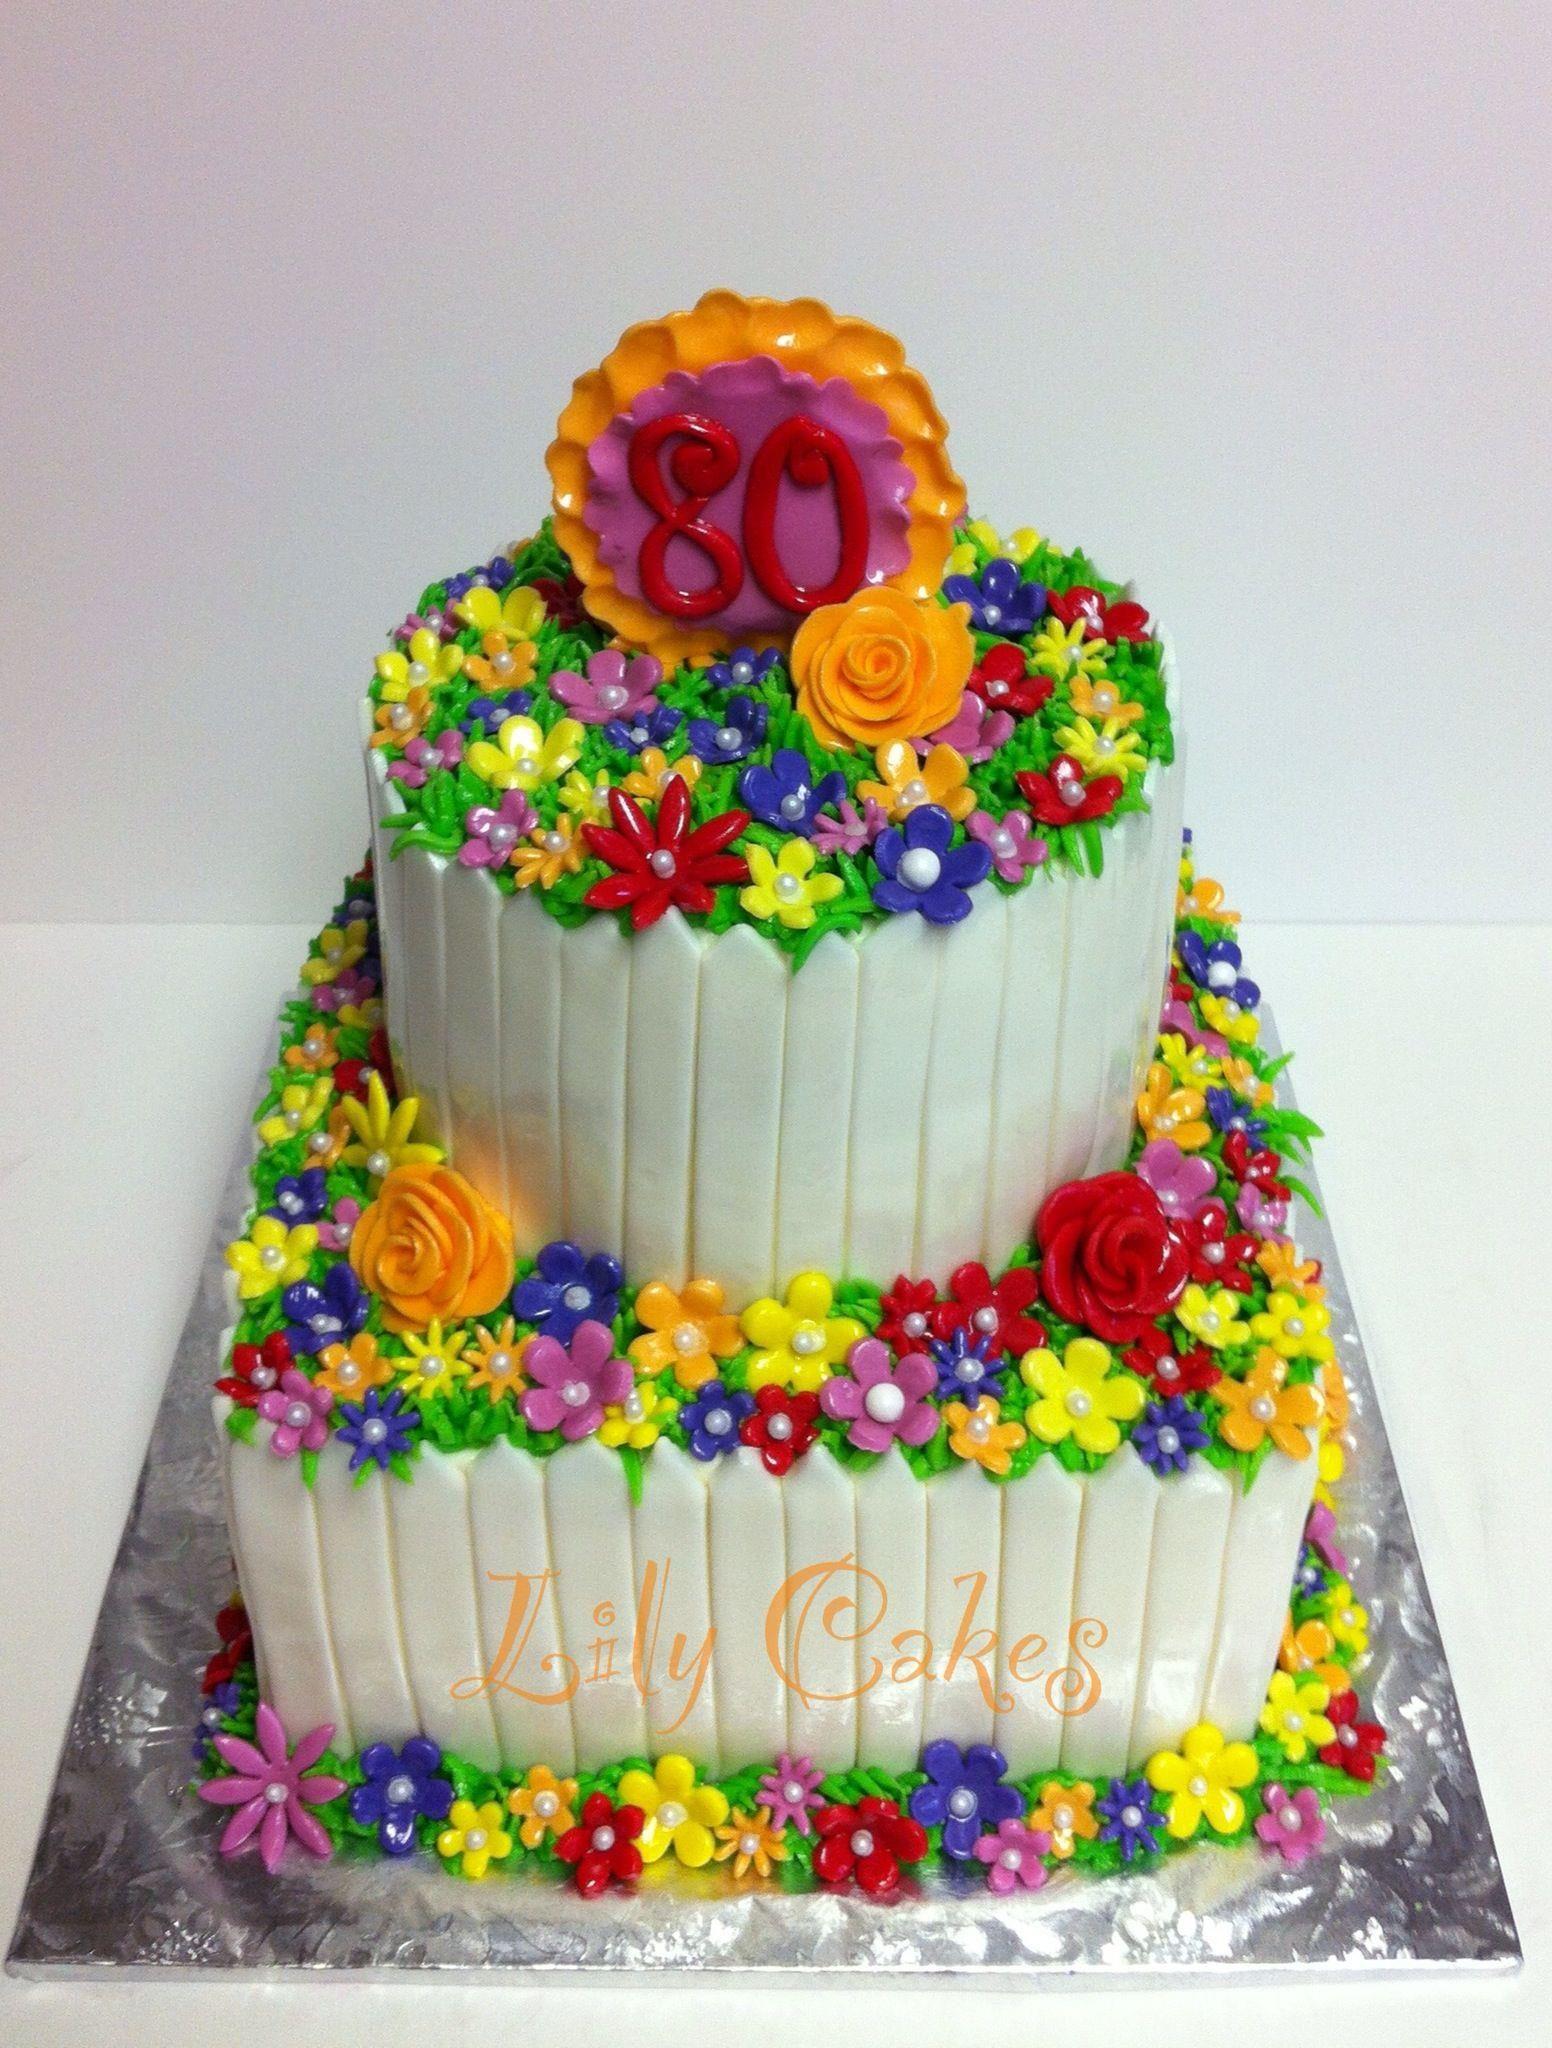 Birthday Cake Photos 6 Round 8 Square With Fondant Flowers And